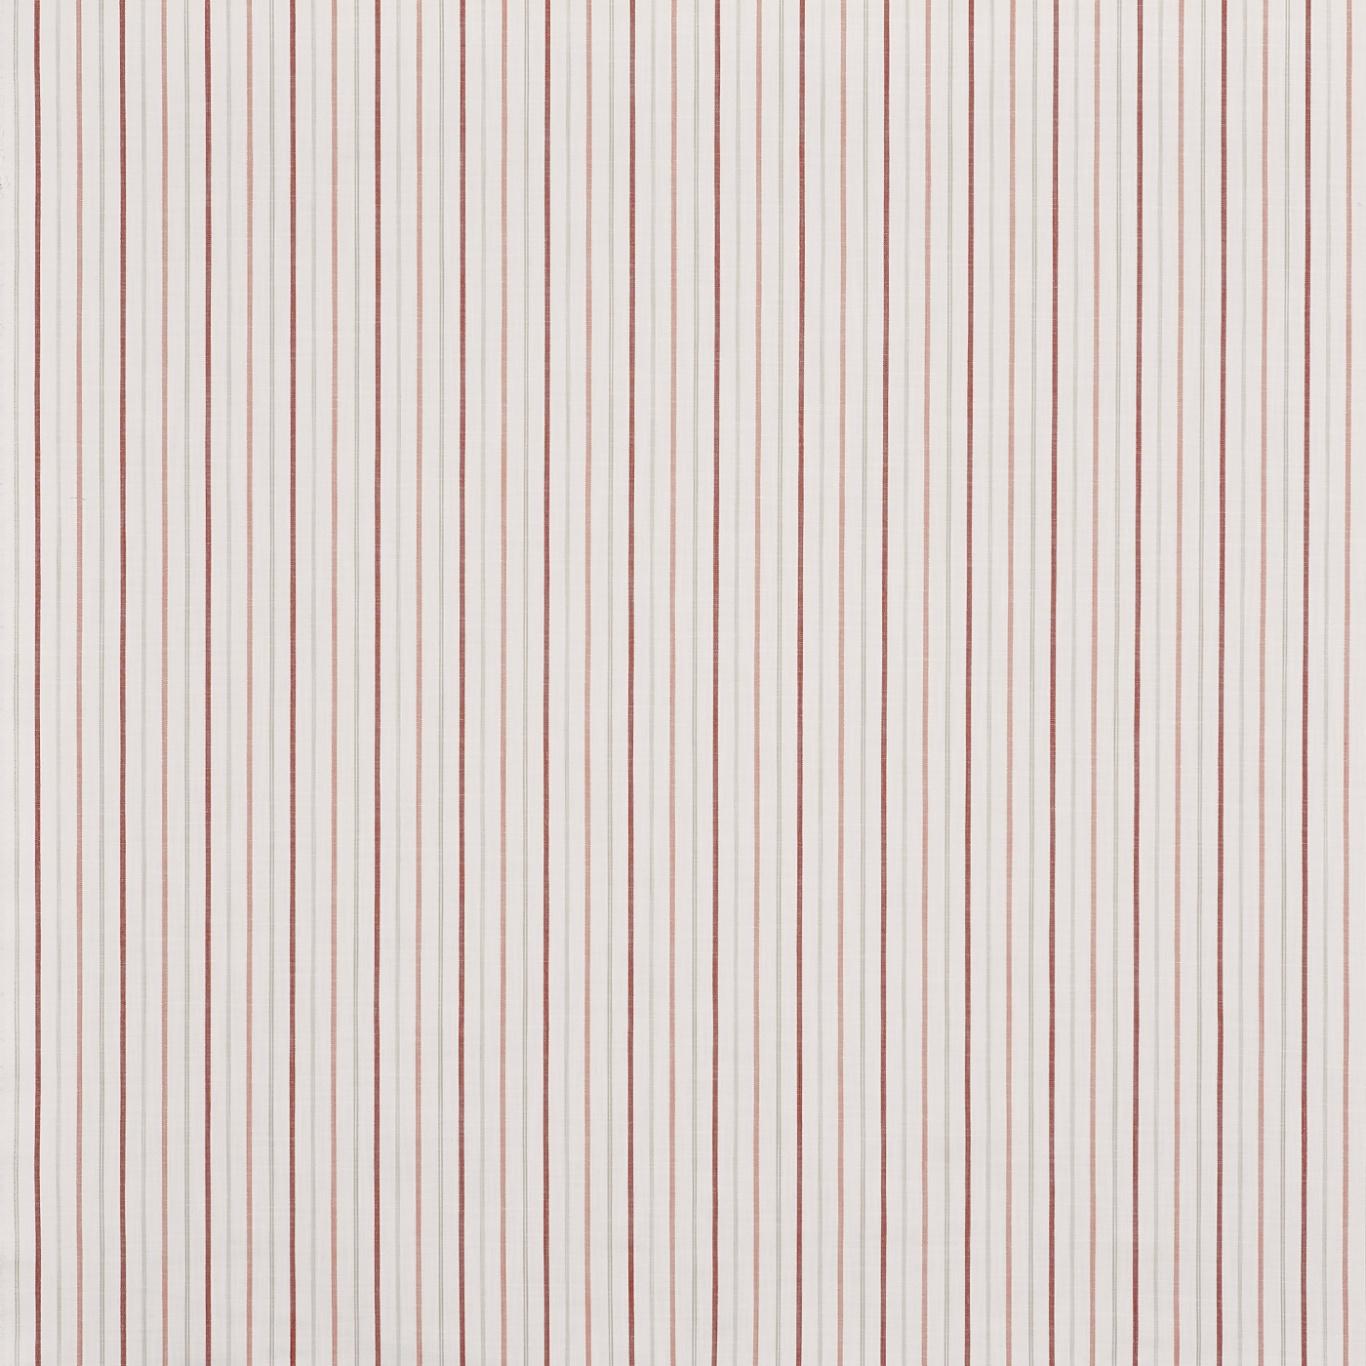 Image of Prestigious Woodmere Coral Fabric 3819/406